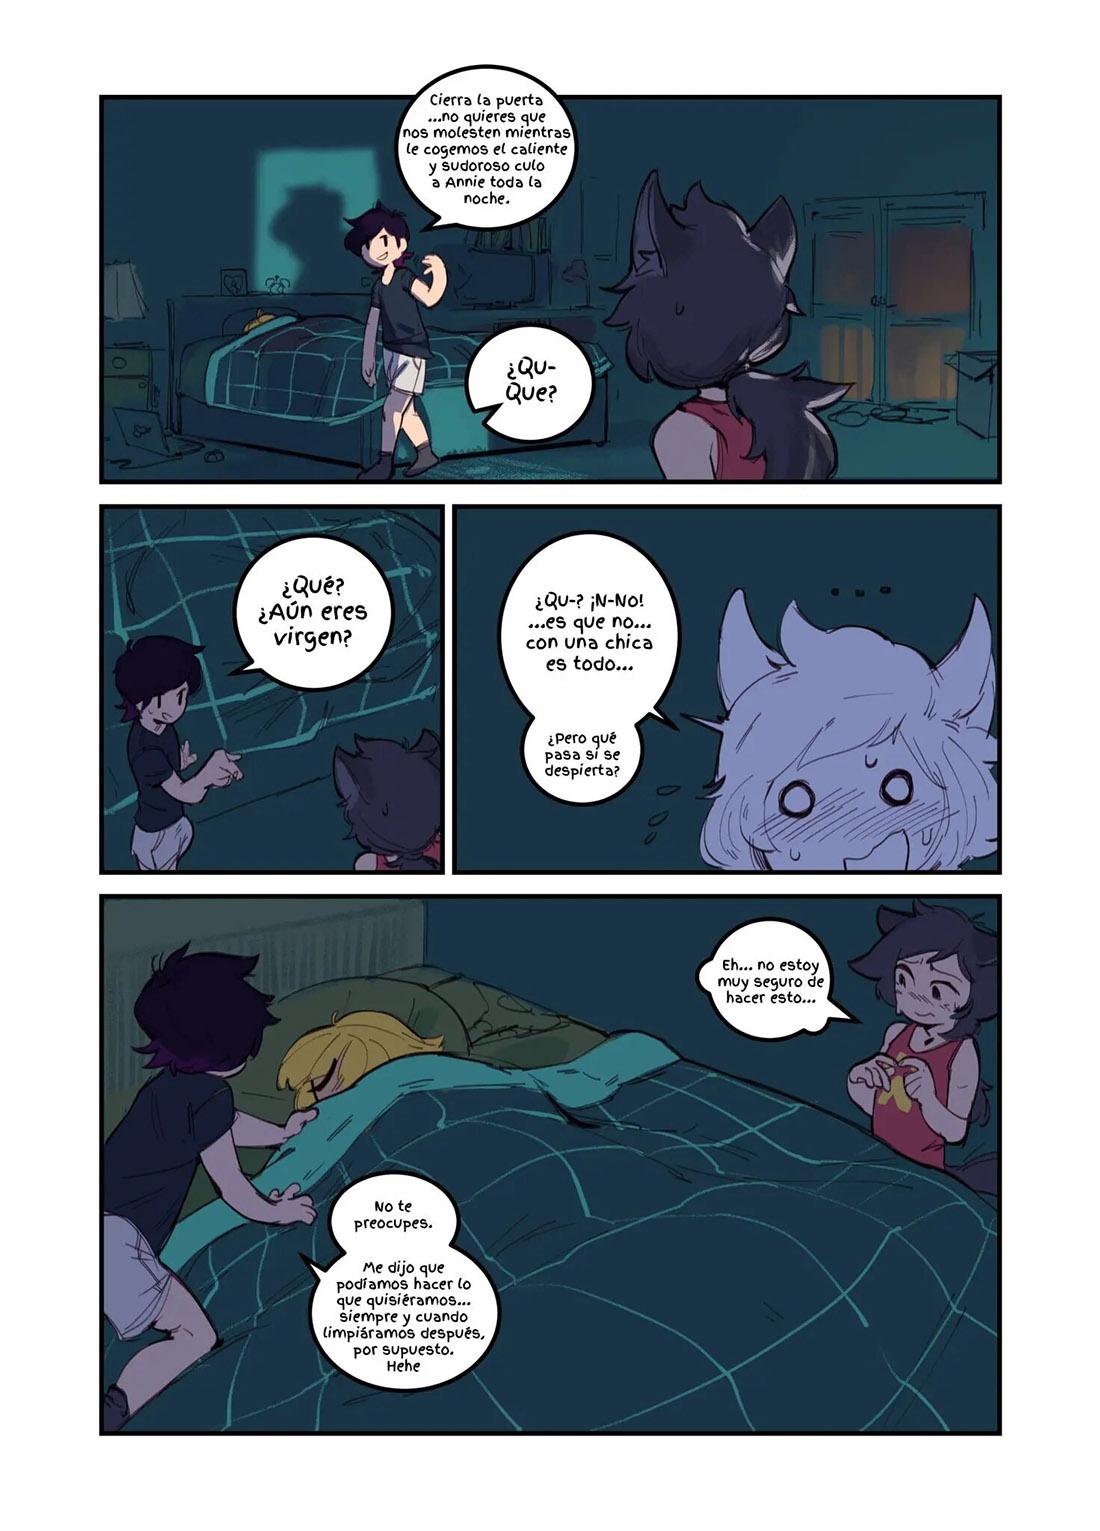 Annies Super Duper x2 SLEEP-OVER